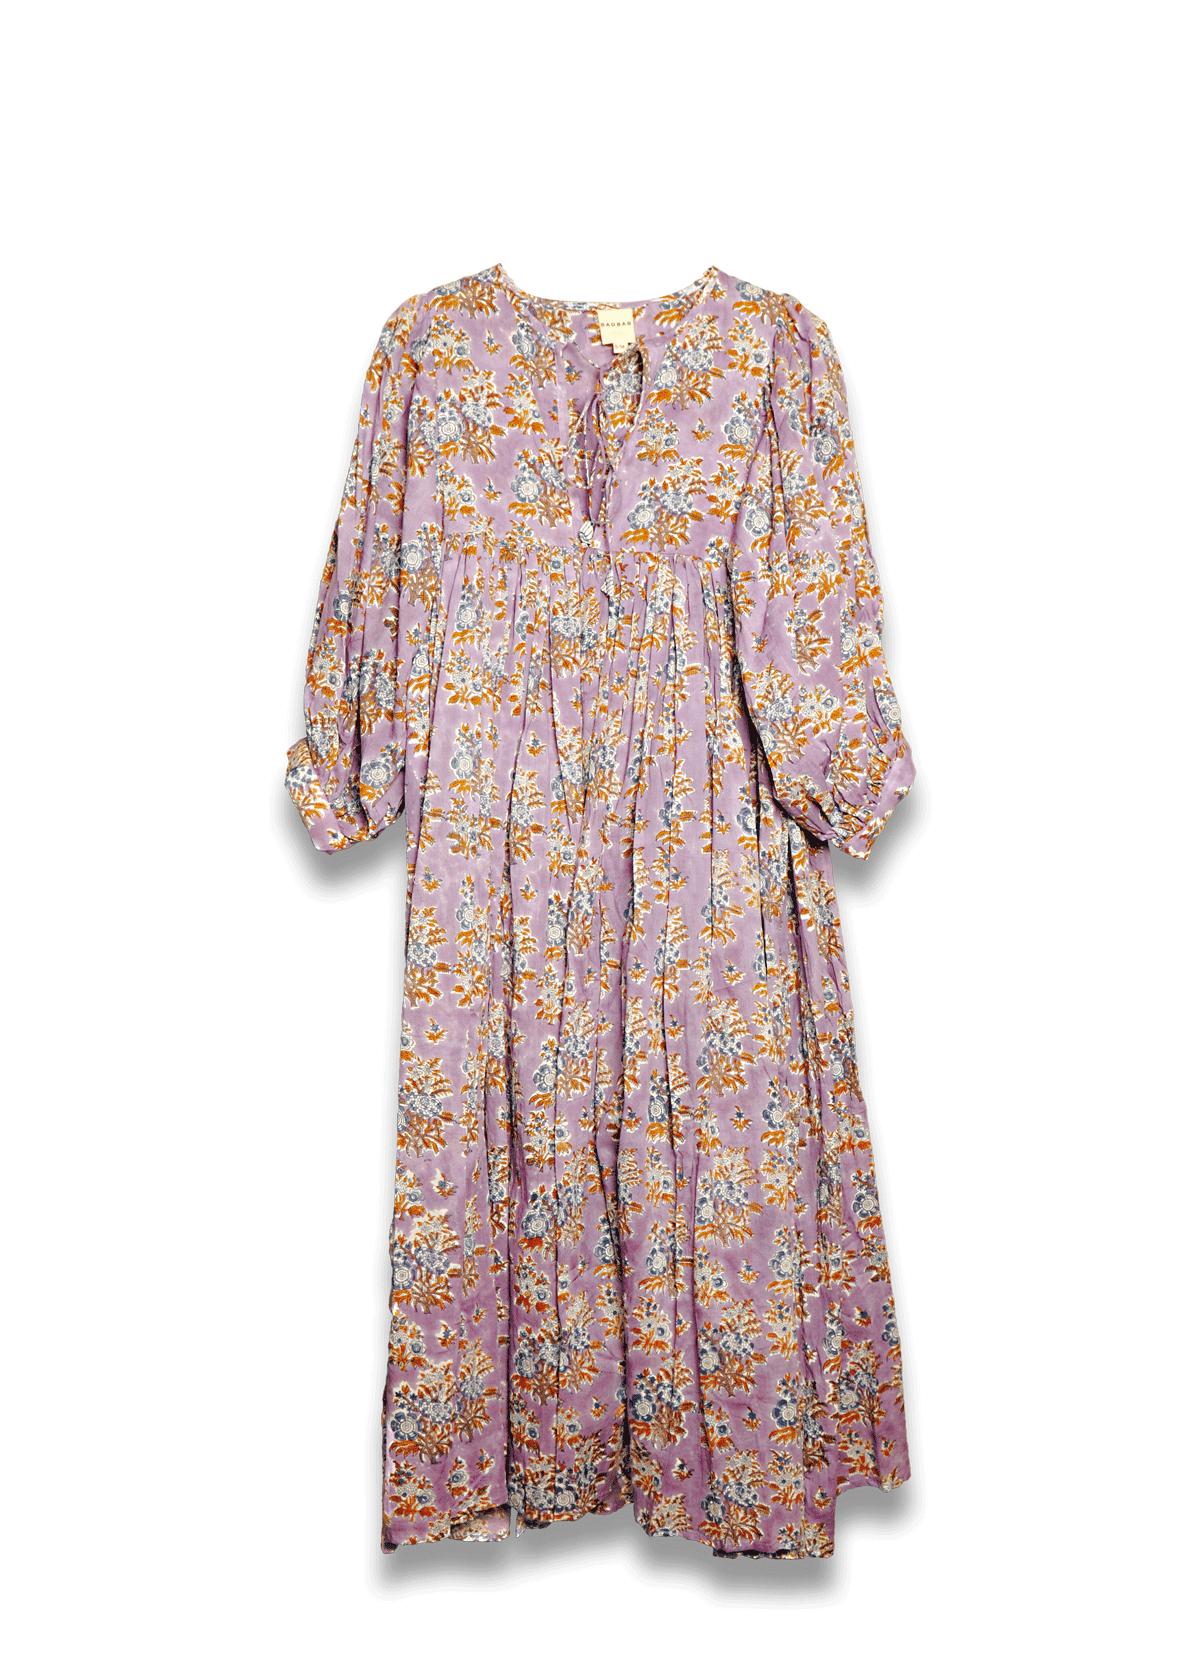 Robe ample ANGY imprimé floral lilas